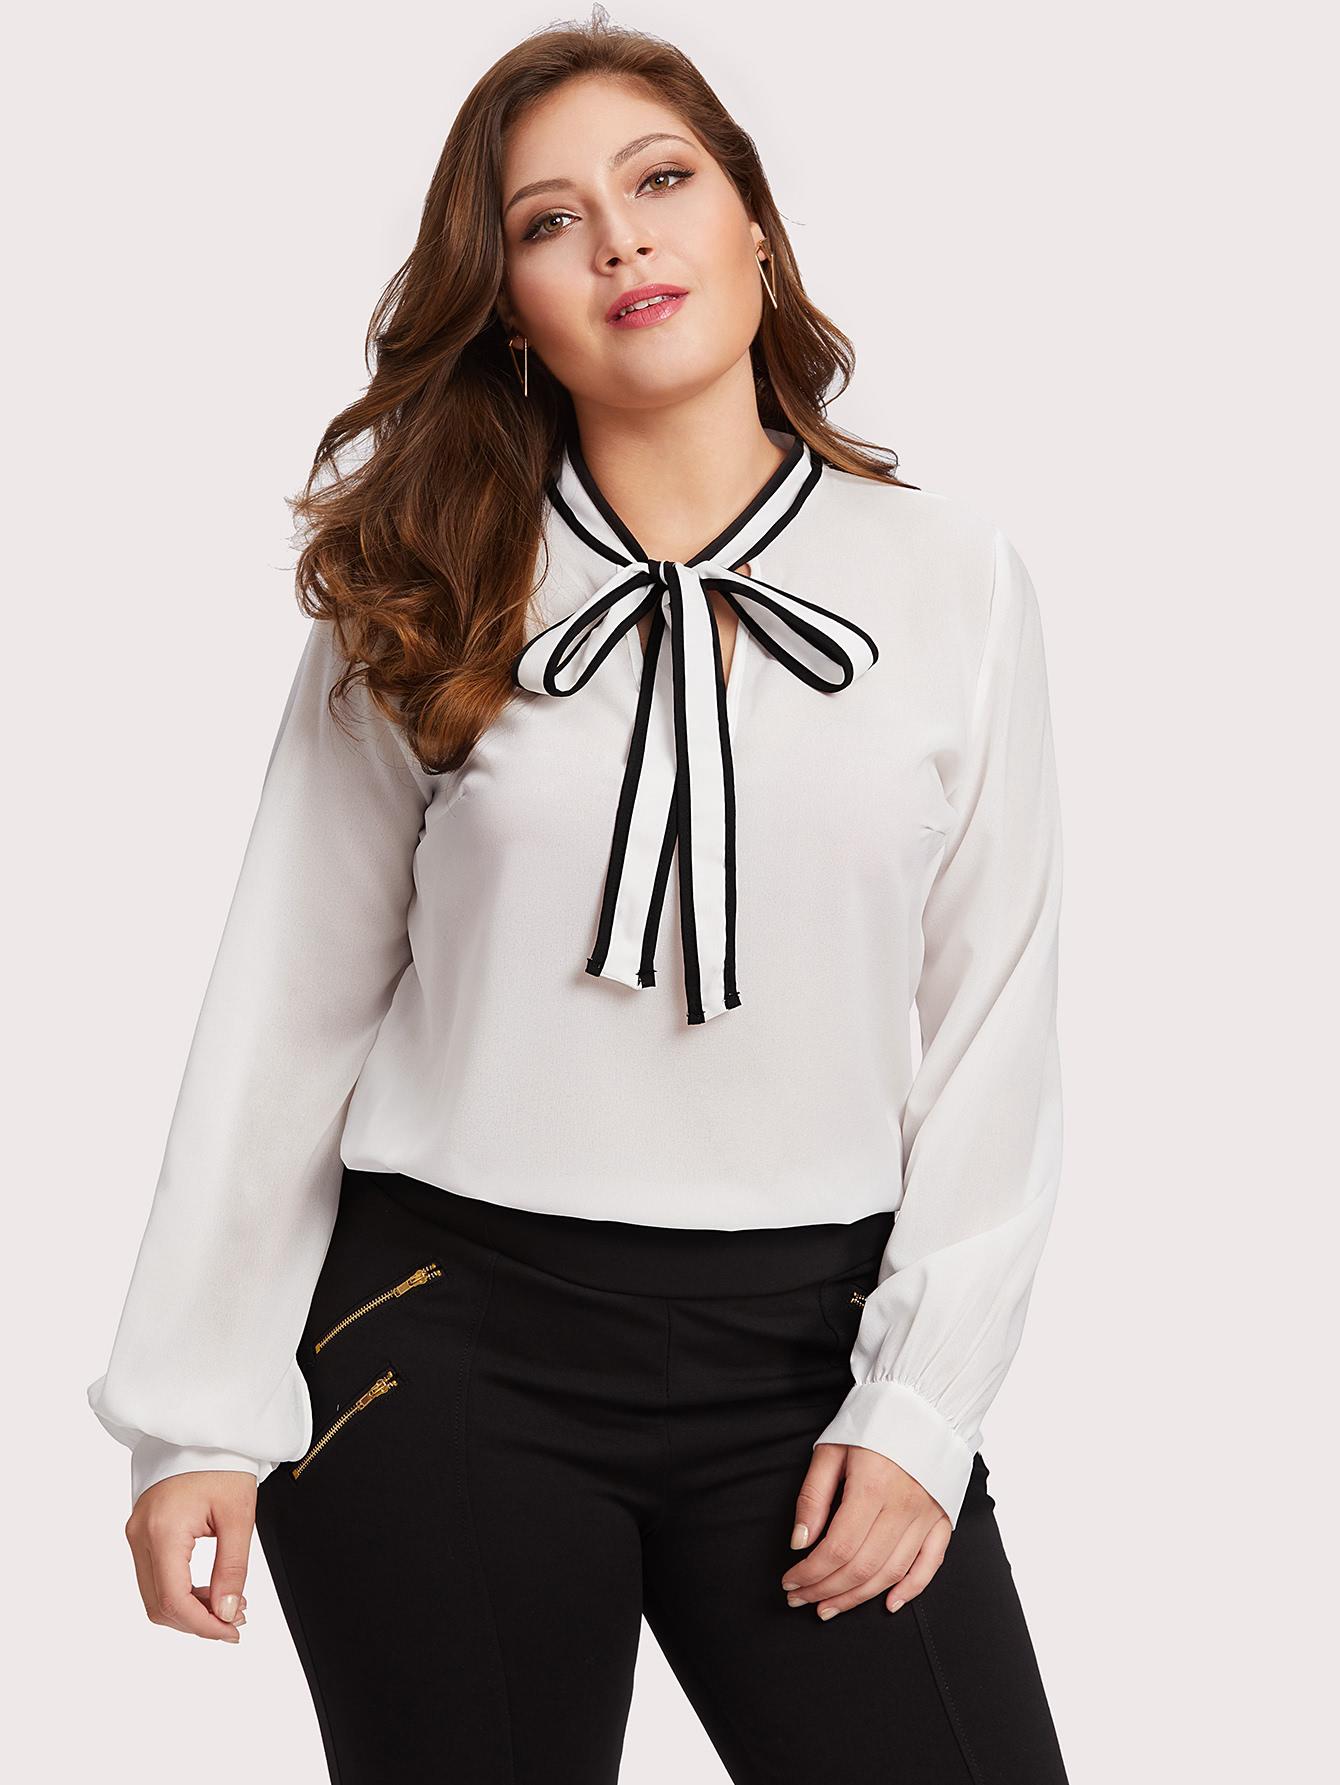 Blusas Tallas grandes por menos de 15 euros en Shein - blusas blancas con lazo